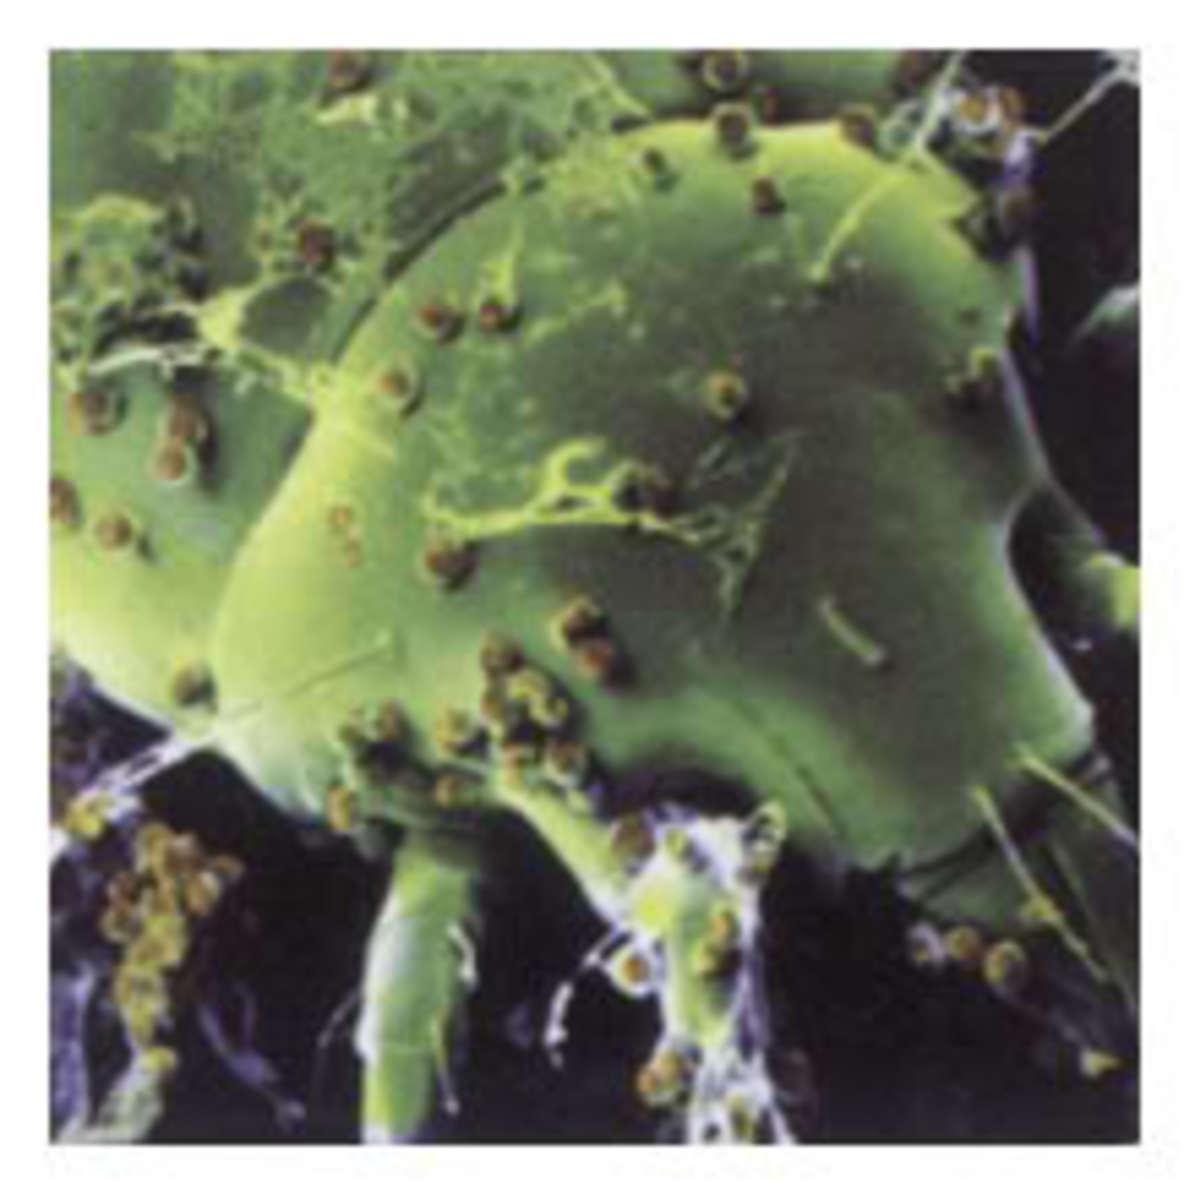 dustmite1